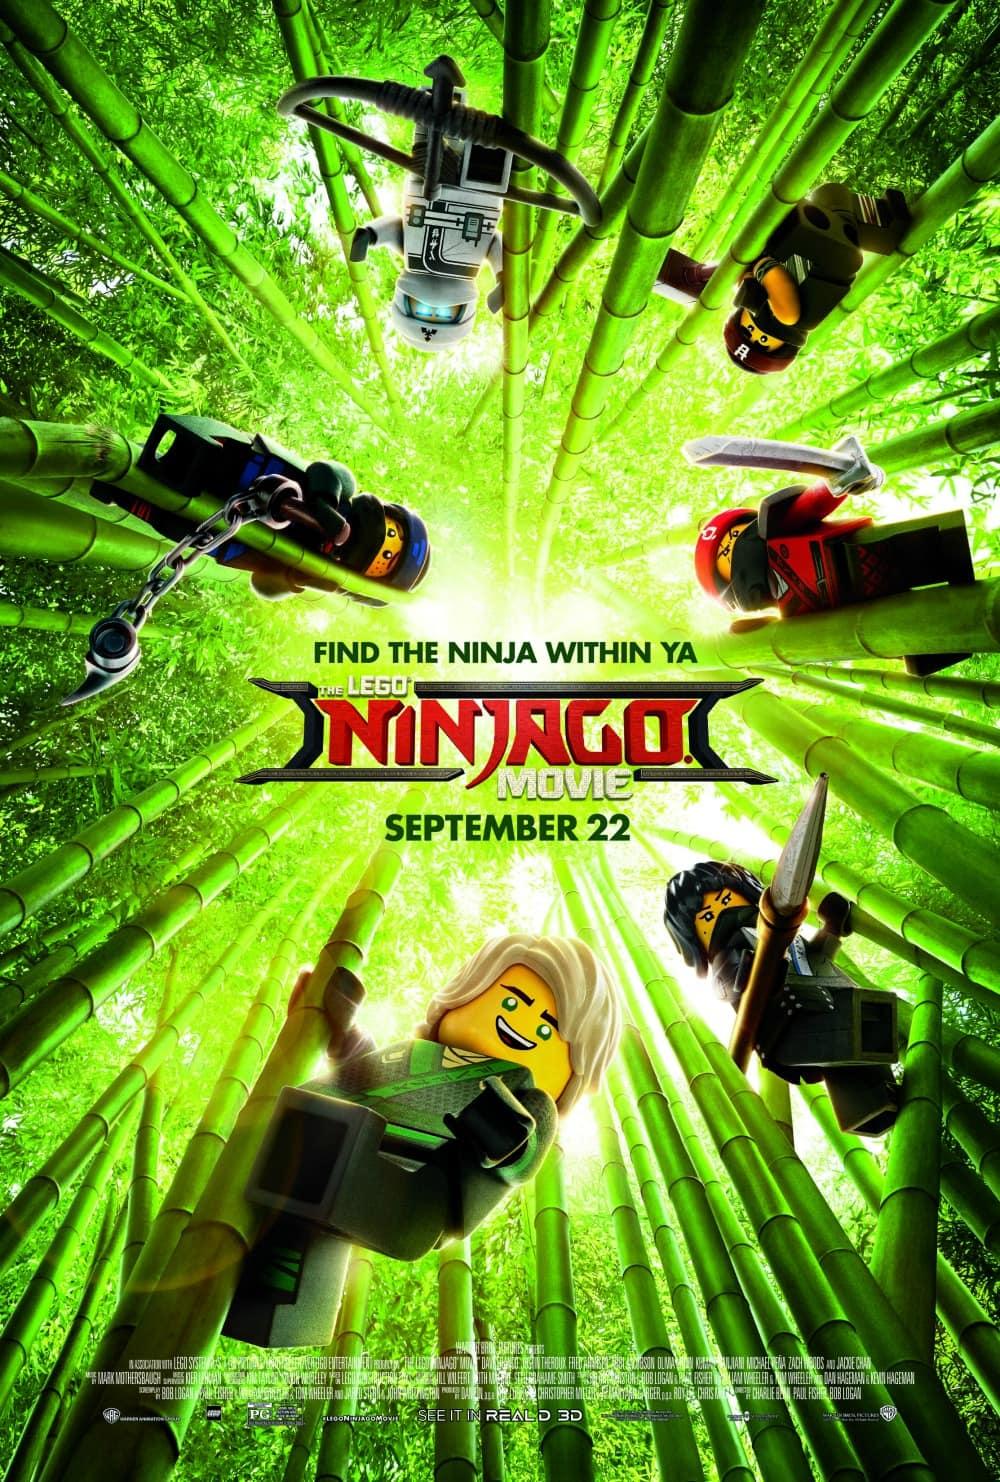 The LEGO NINJAGO Movie - Fun Game and Giveaway #LEGONINJAGOMovie @Fandango#ad